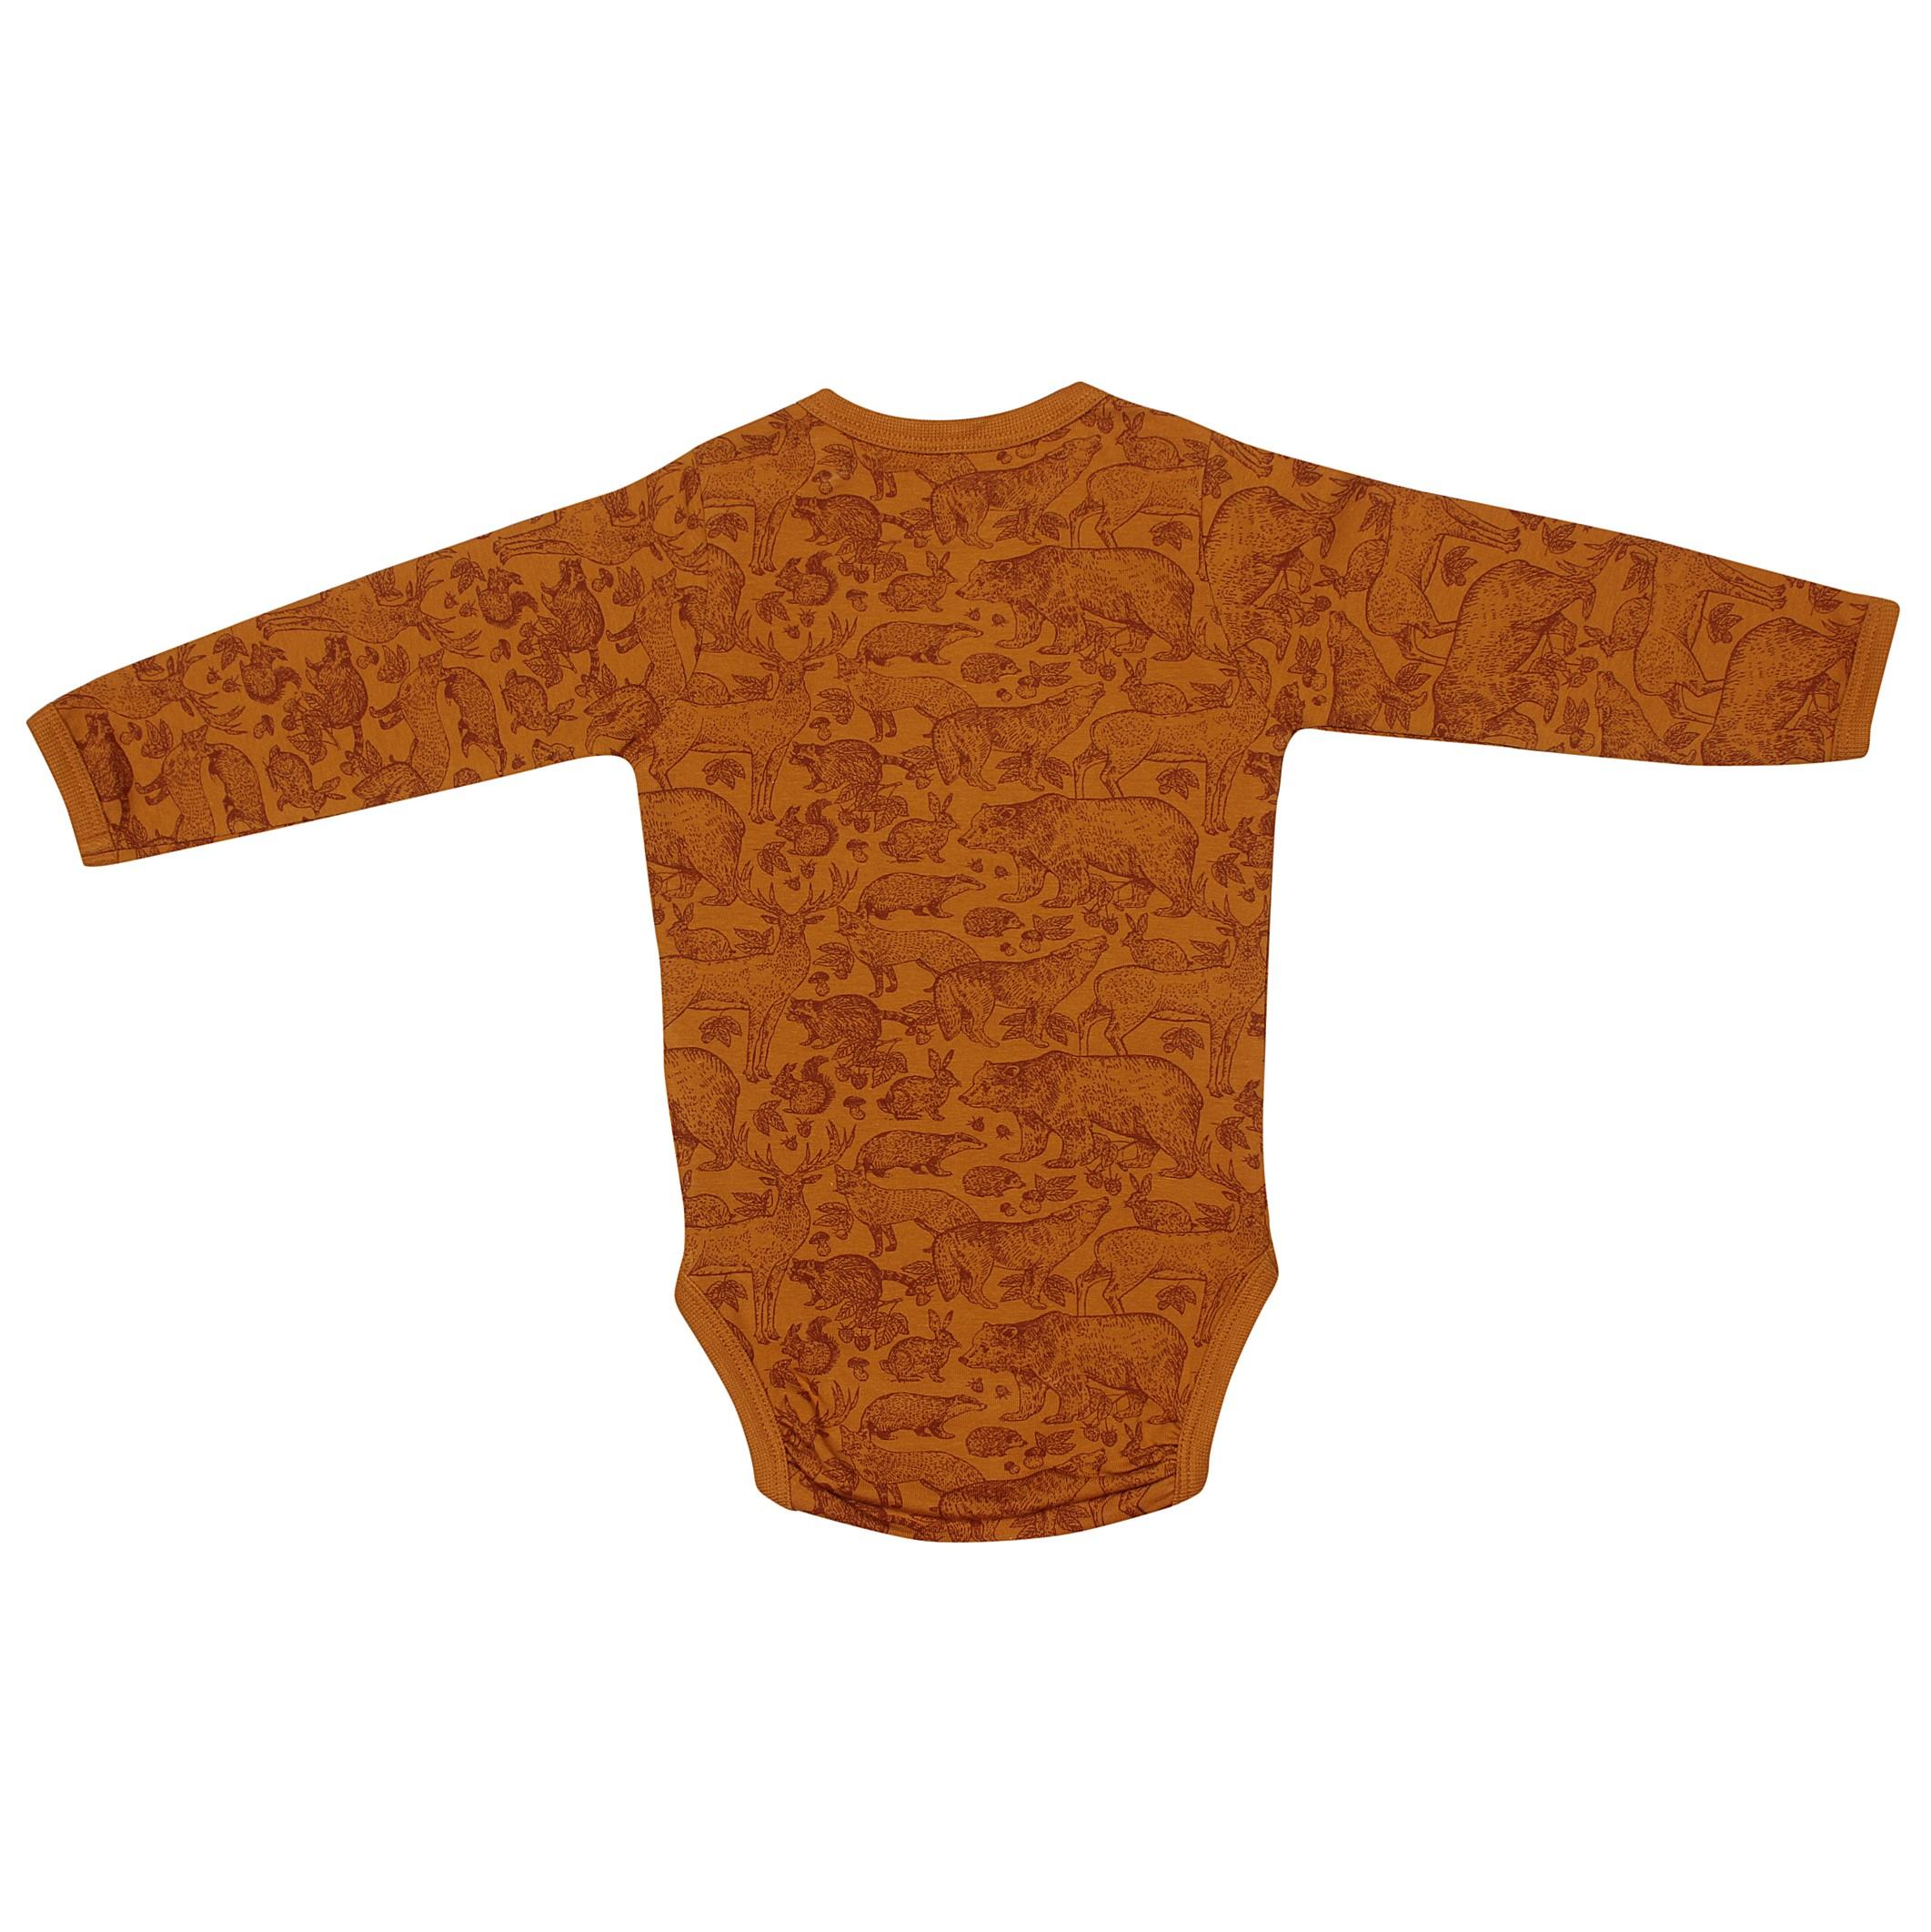 KIDS UP BABY | BODY MED SKOVENS DYR - KARRY